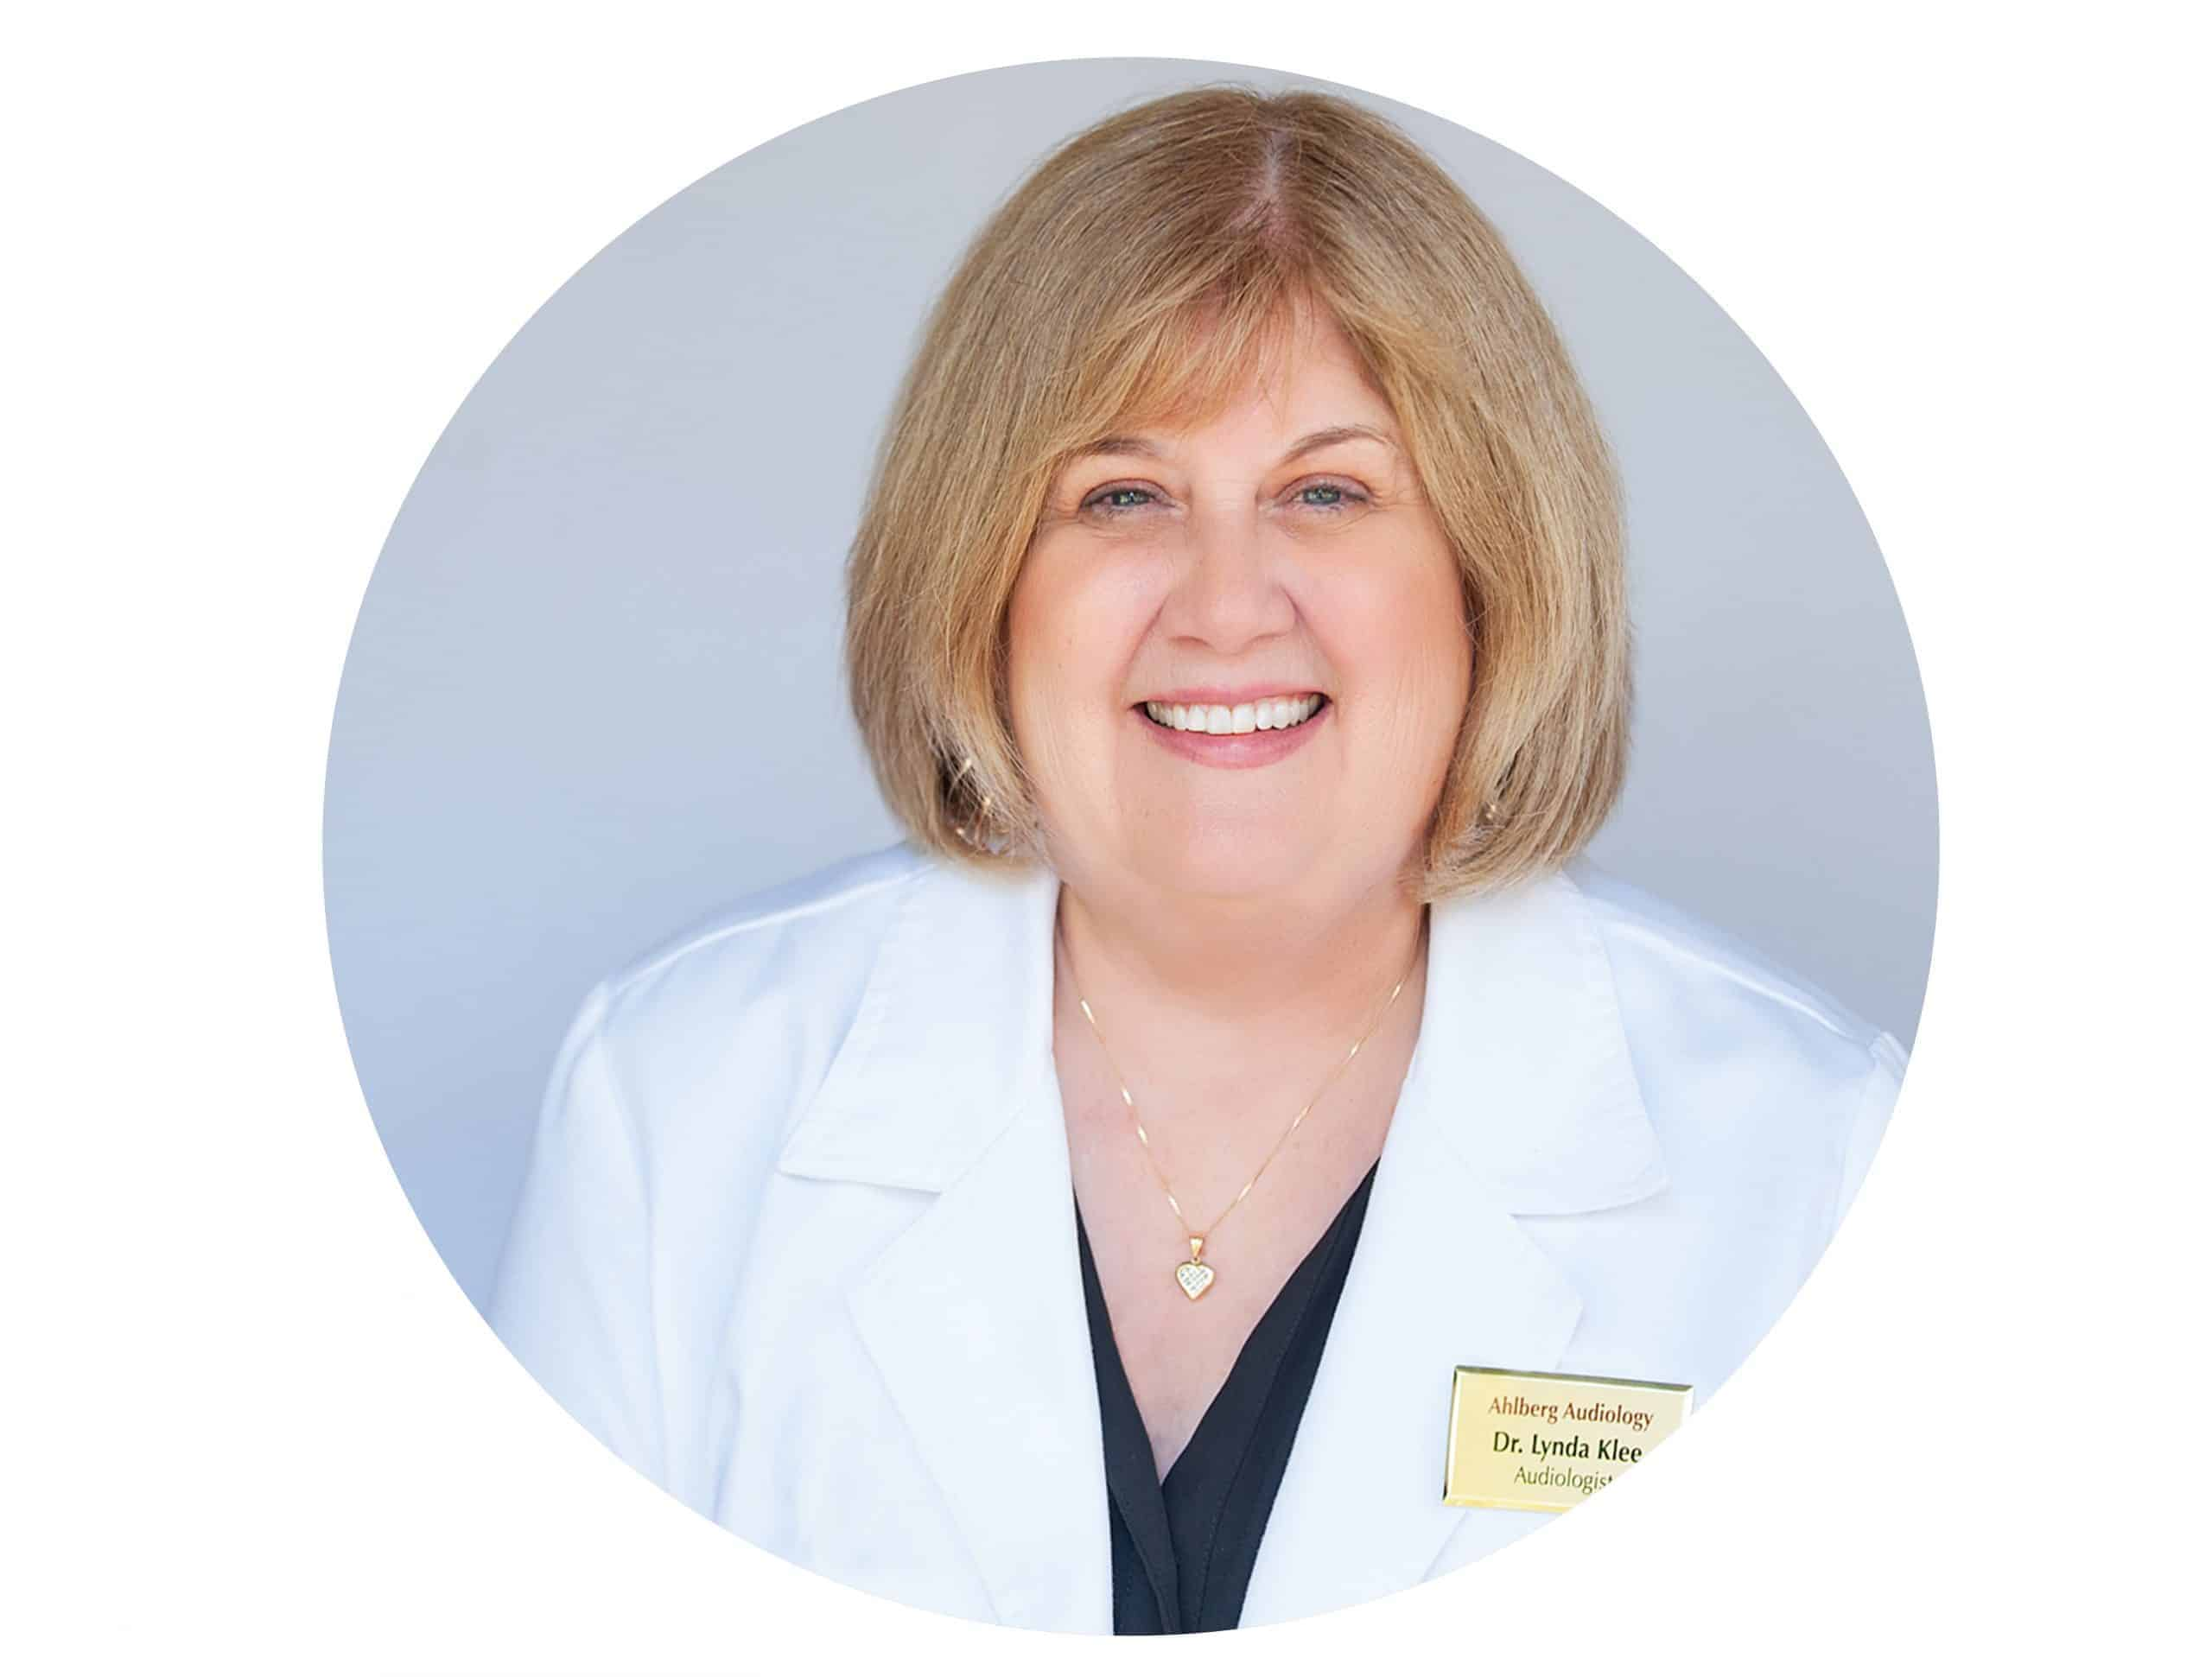 Dr. Lynda Klee, Audiologist